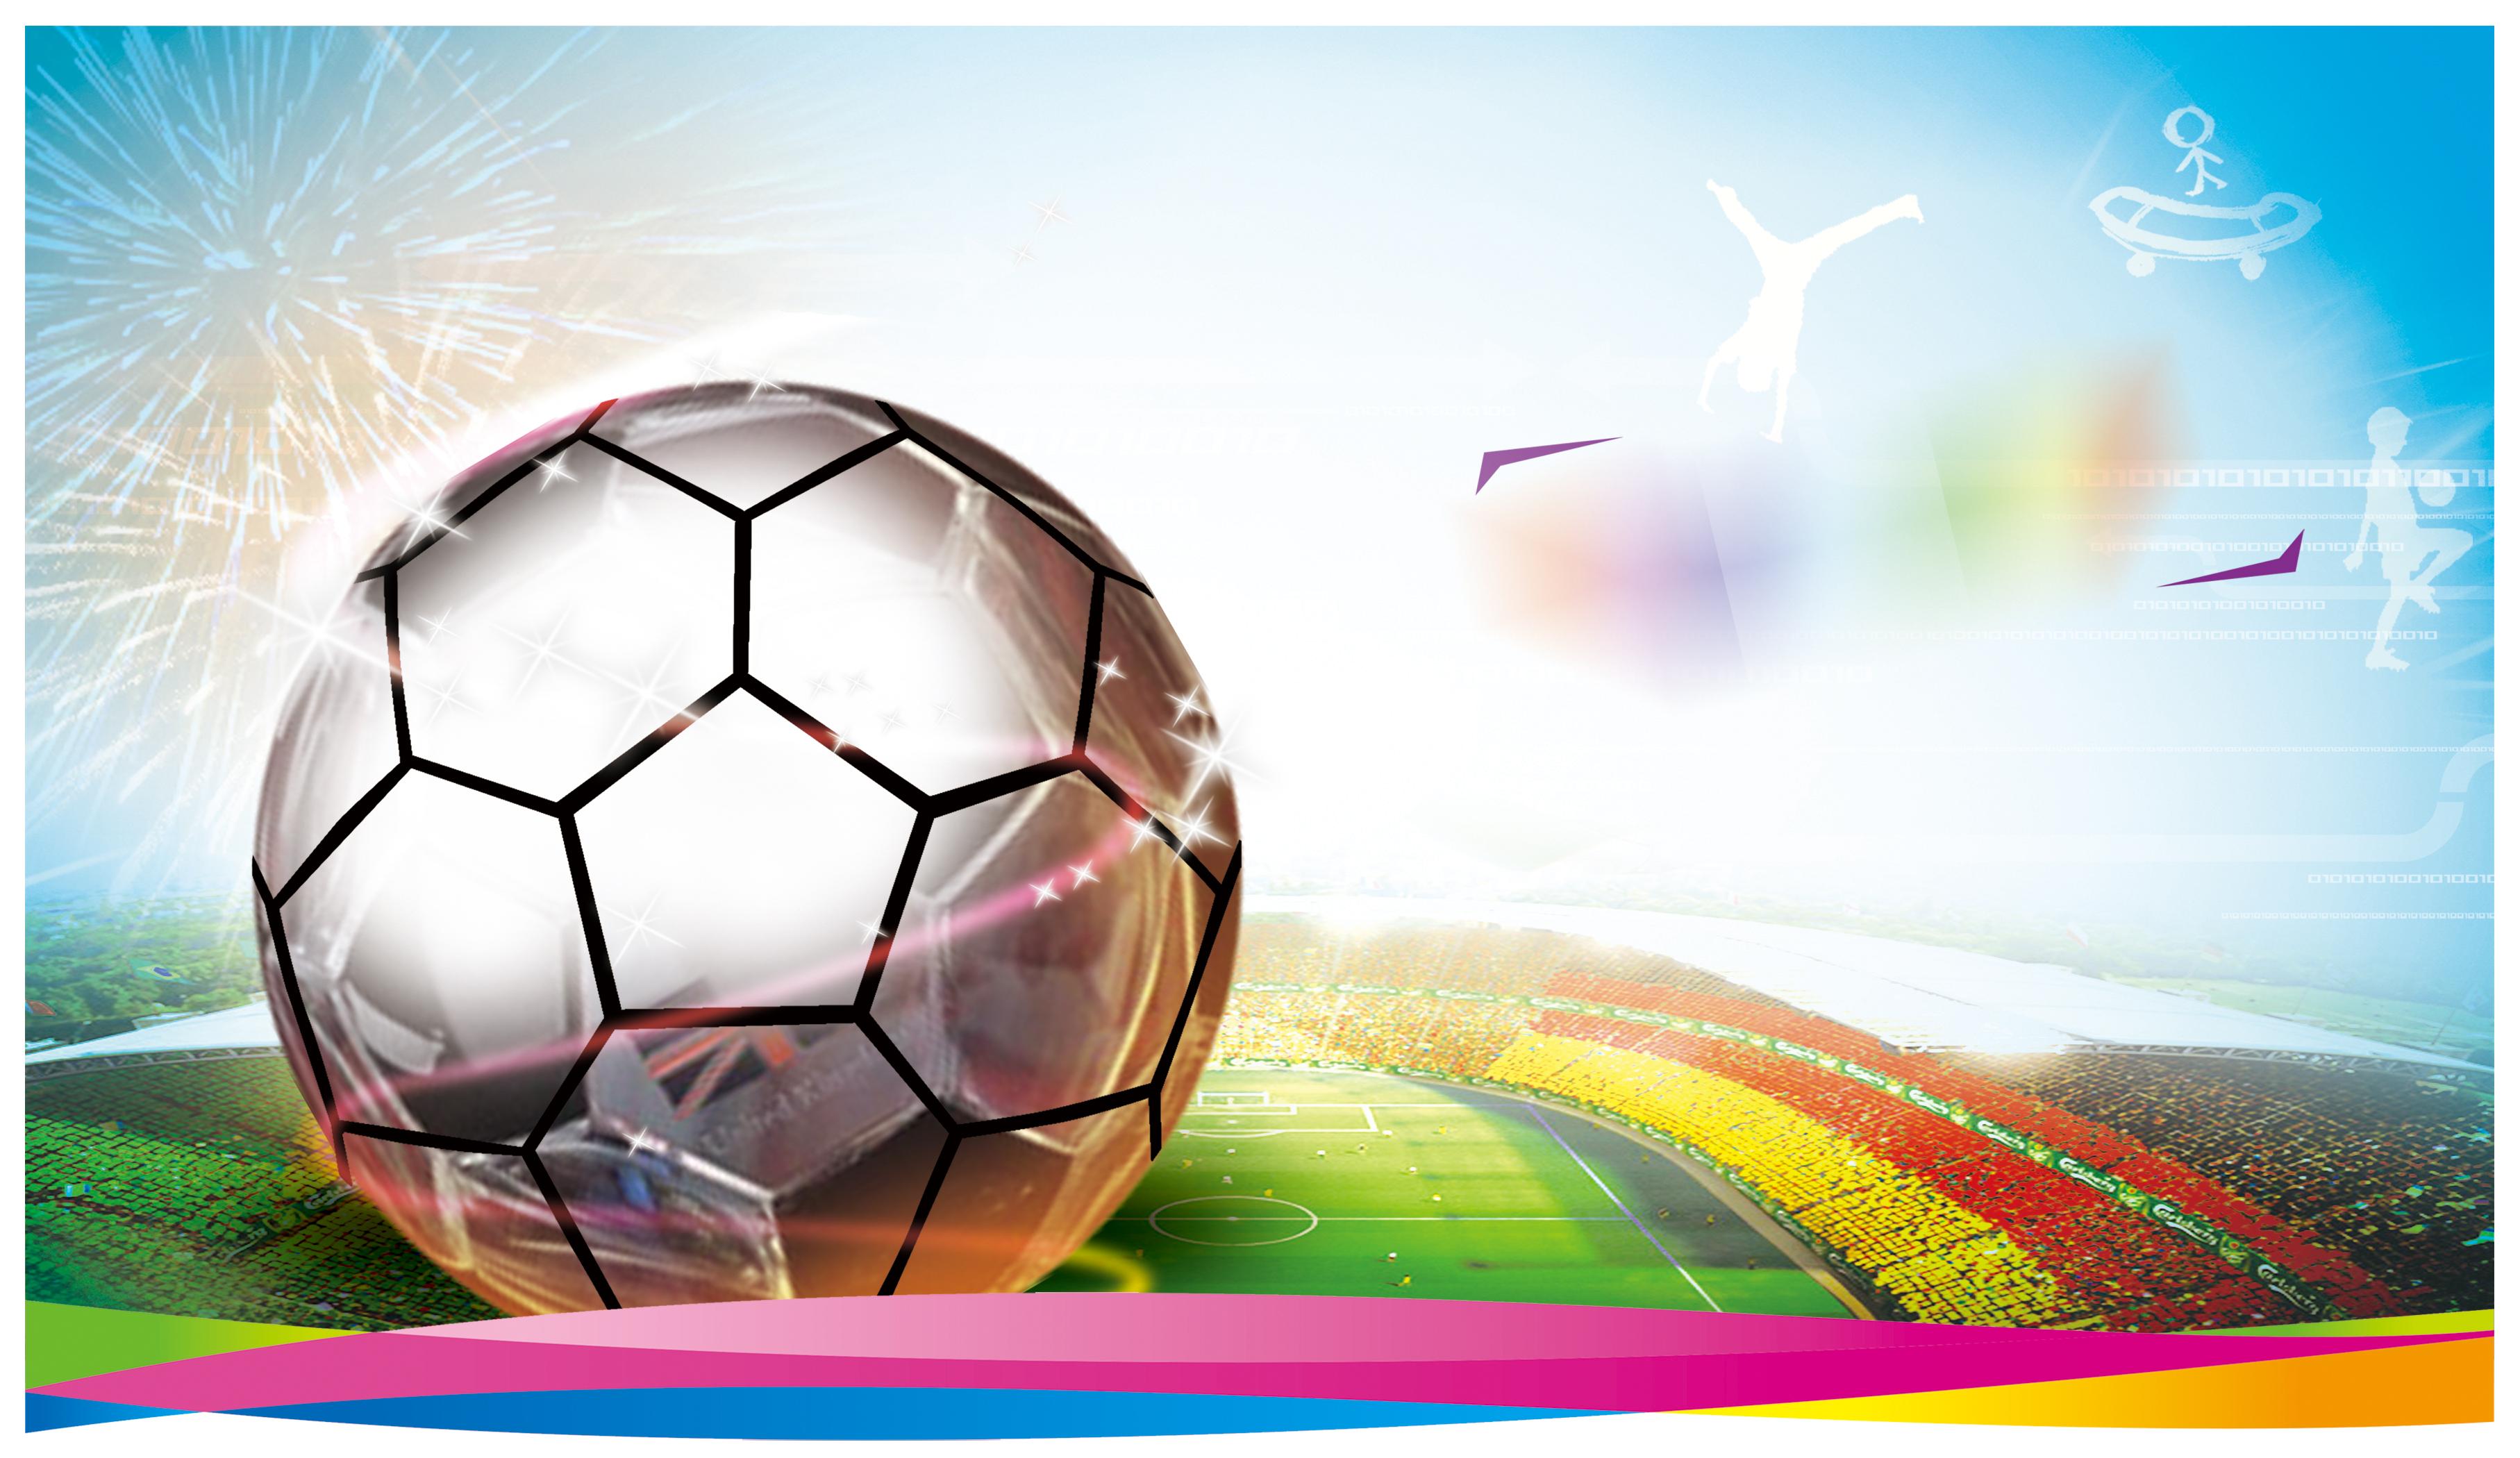 Pertandingan sepak bola poster latar belakang Bola Sepak